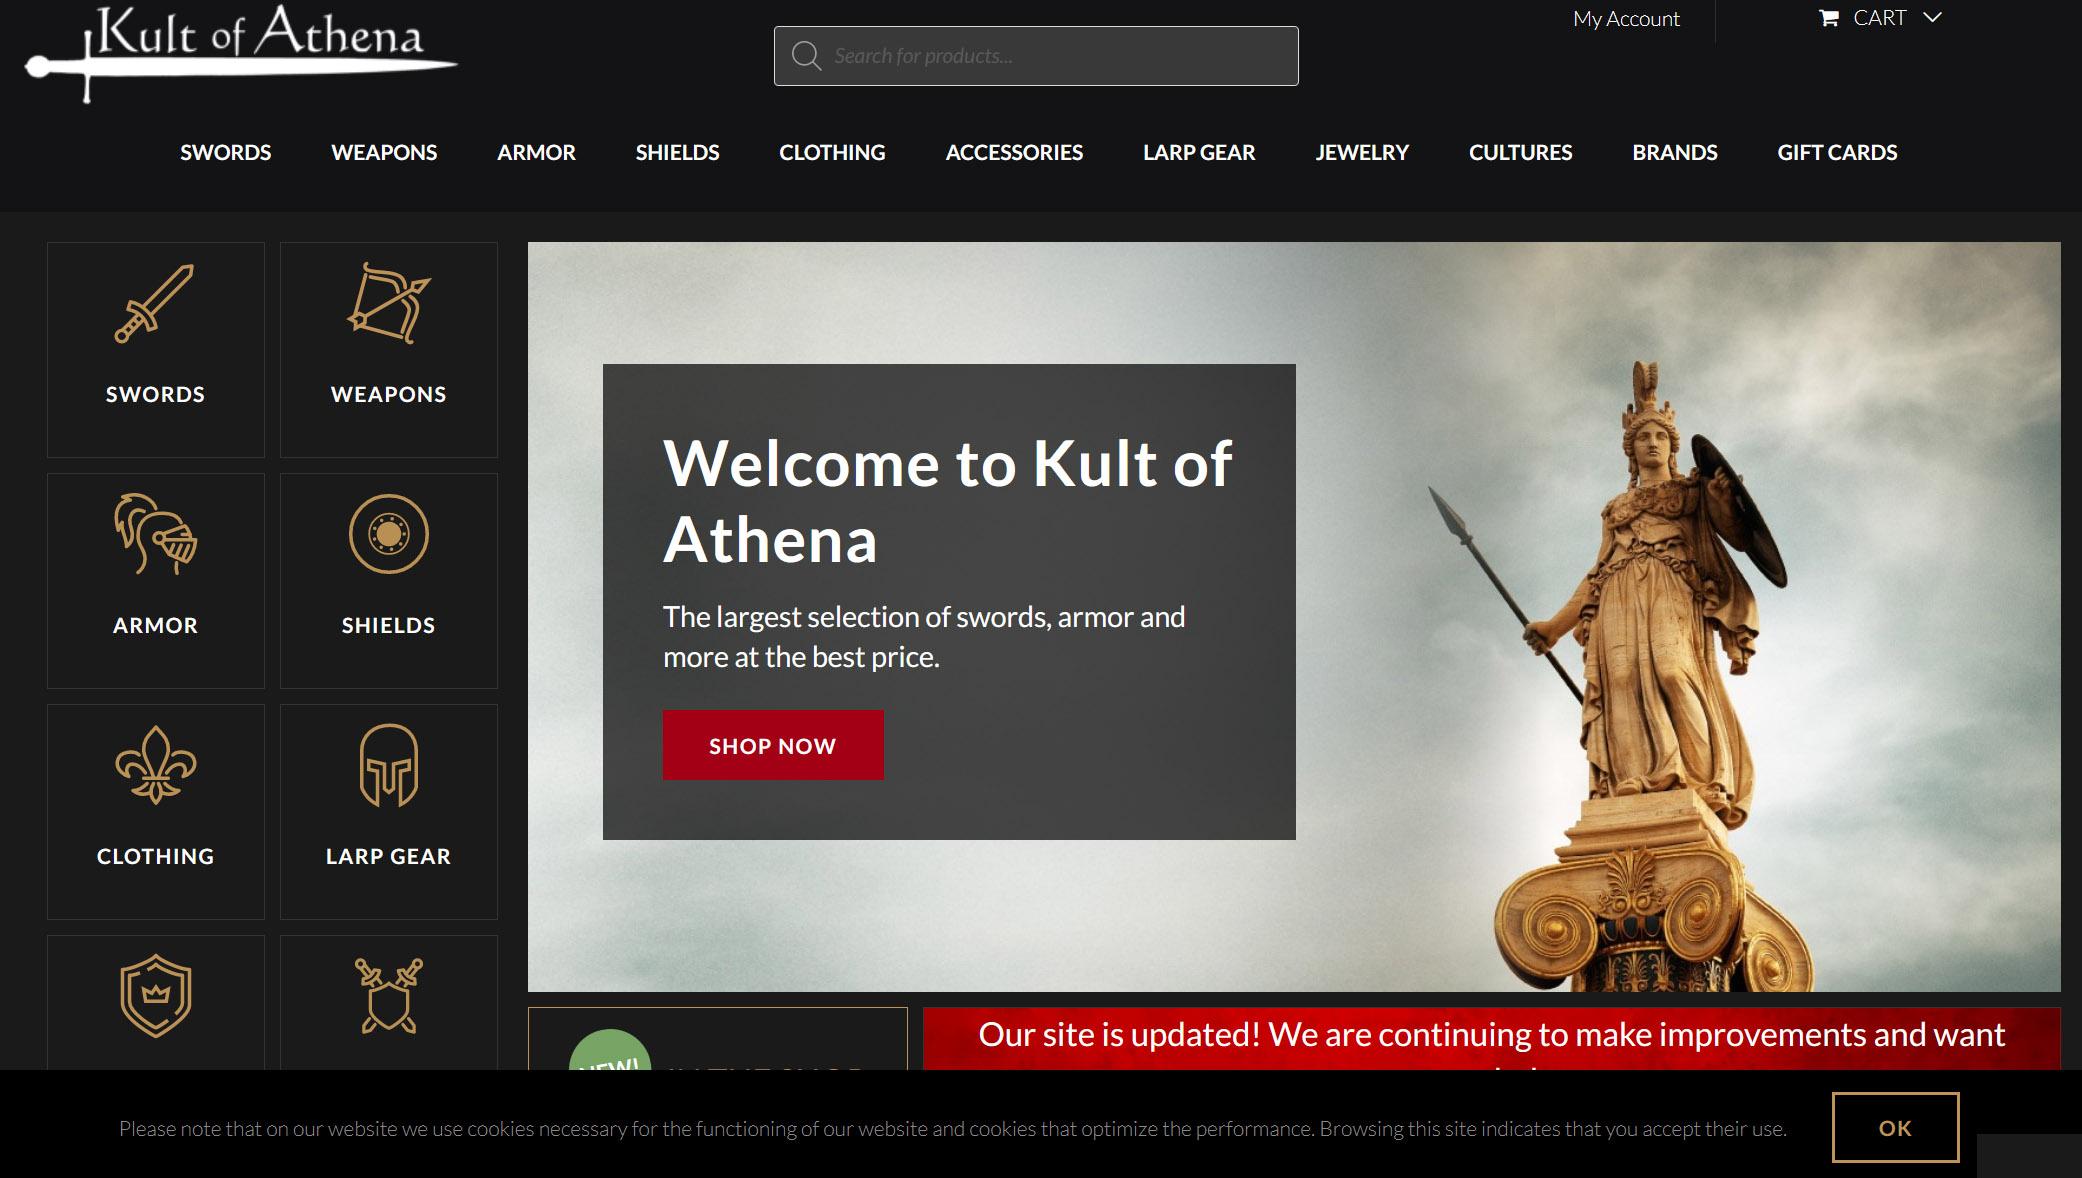 Kult of Athena Customer Feedback